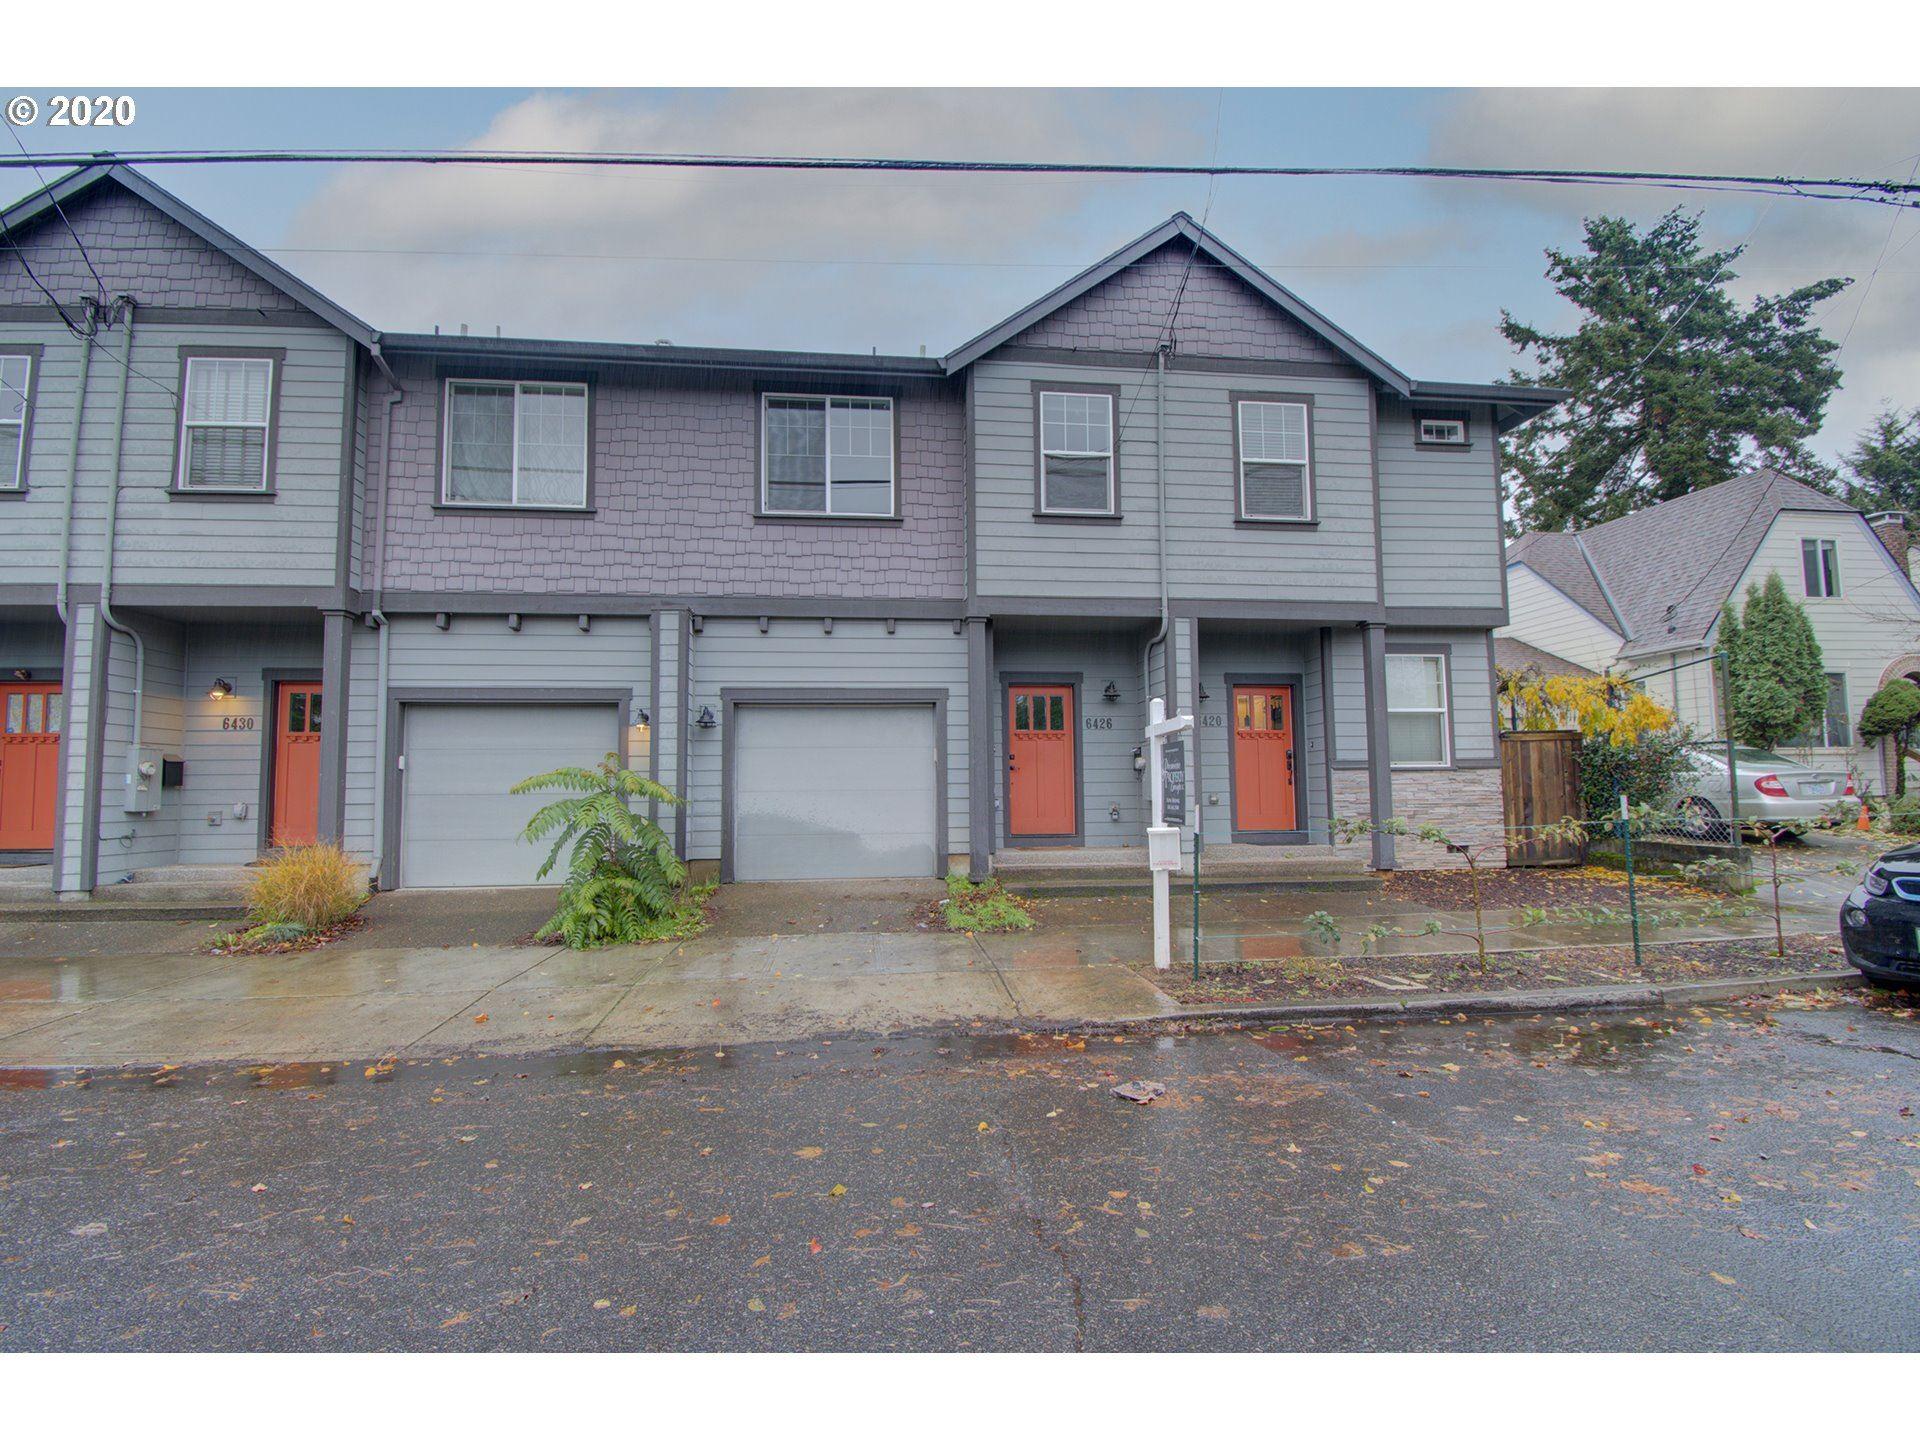 6426 N MARYLAND AVE, Portland, OR 97217 - MLS#: 20149951